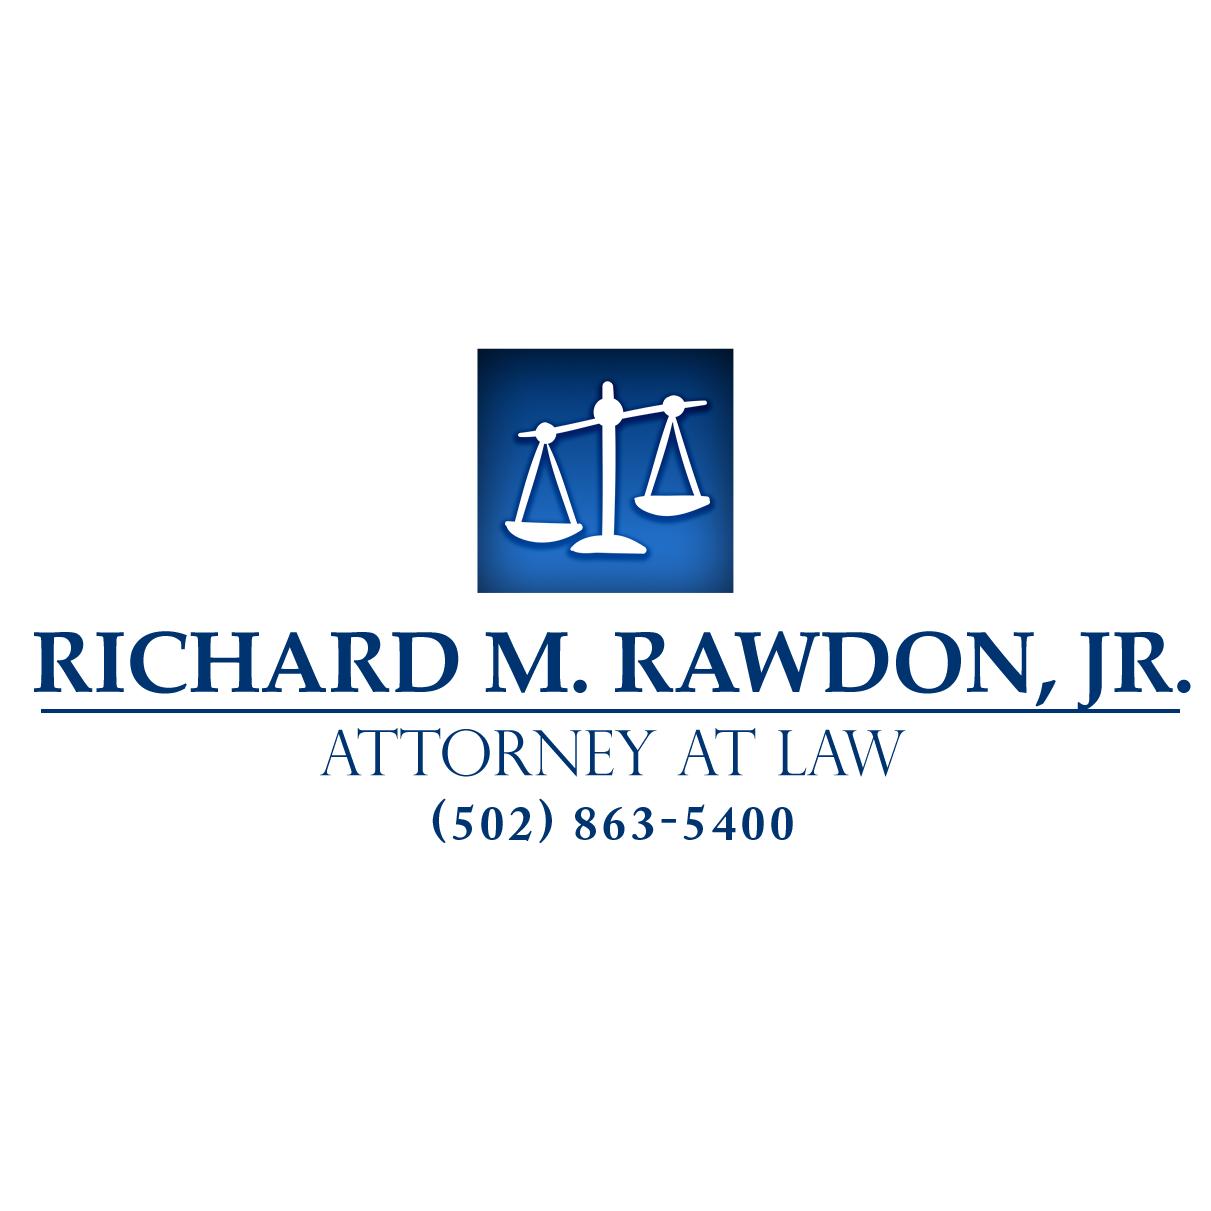 Richard M. Rawdon, Jr. Attorney at Law